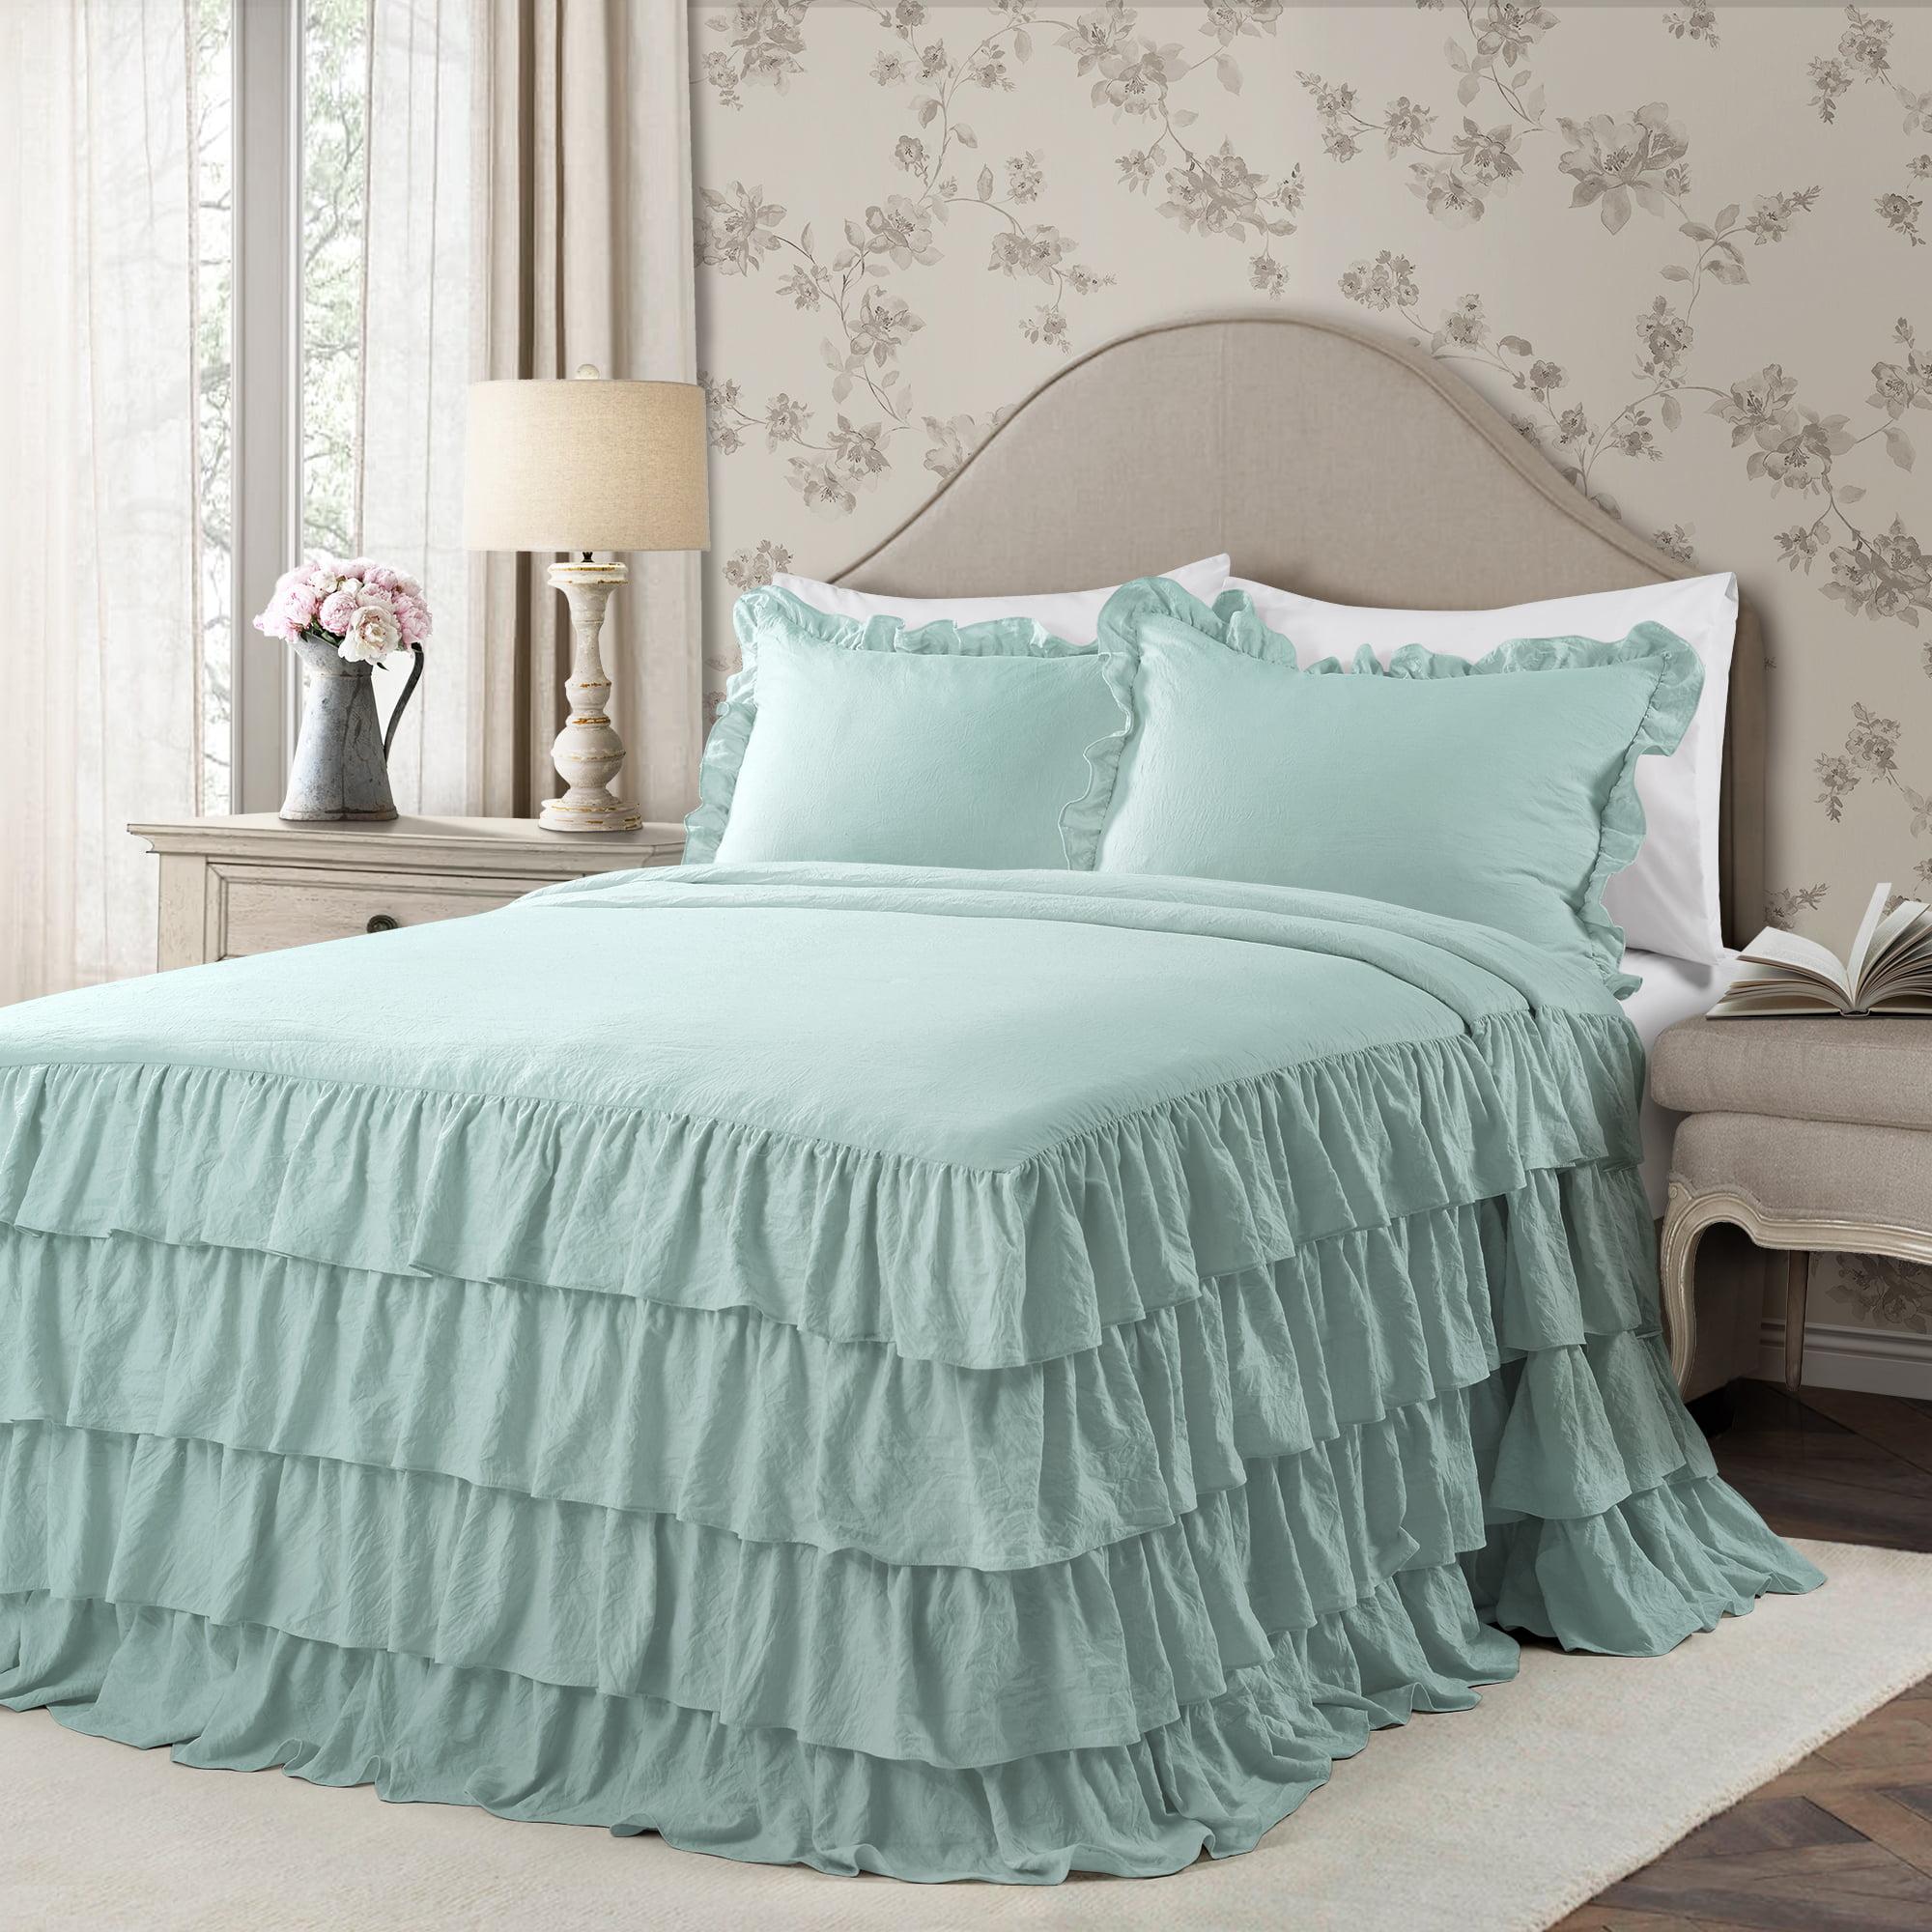 Lush Decor Allison Ruffle Skirt Polyester Bedspread, Full, Aqua, 3-Pc Set